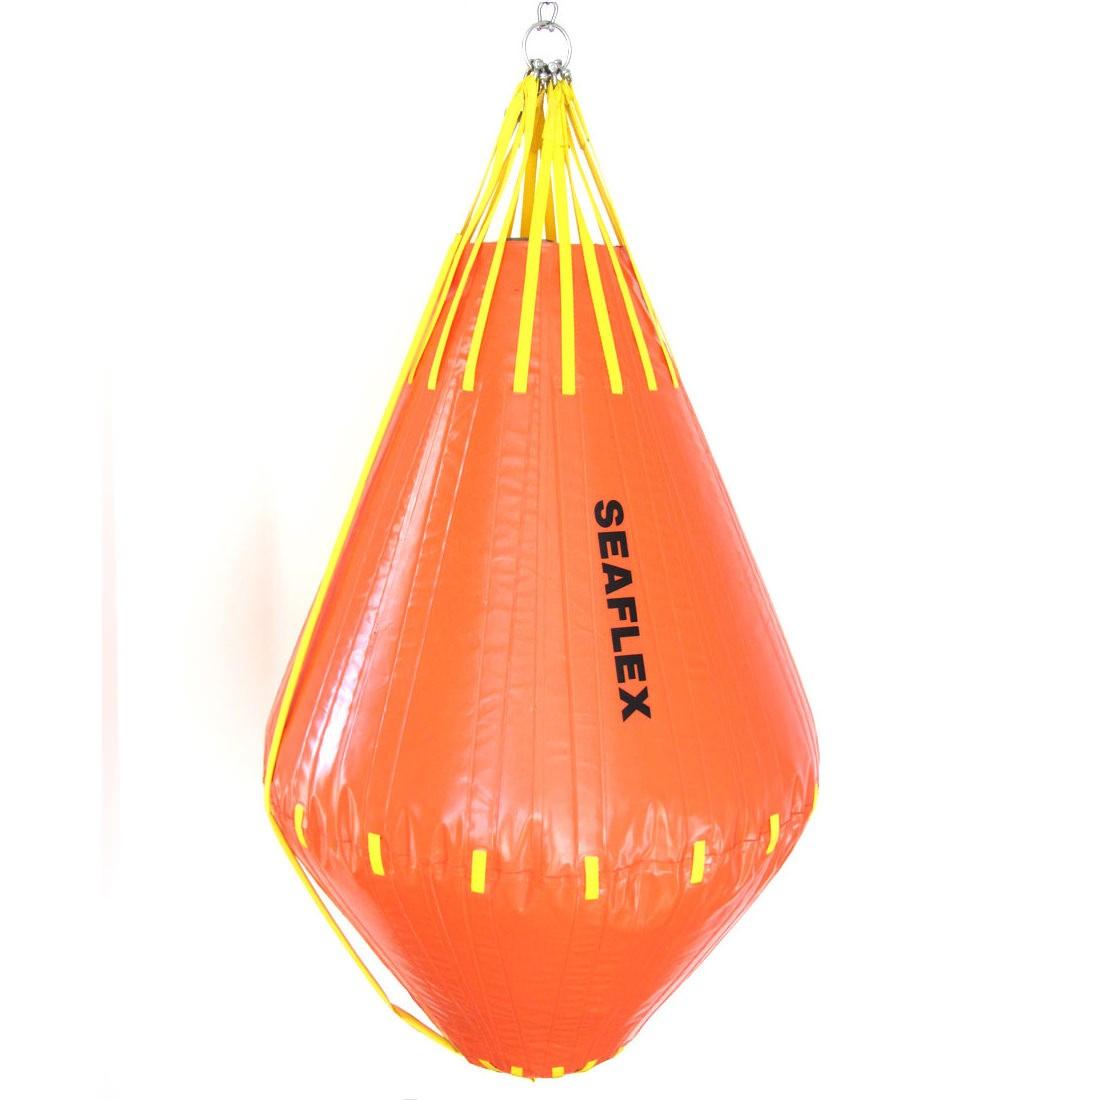 Seaflex Waterload Bag 2200 lbs Lift Capacity SEF-1-WLB